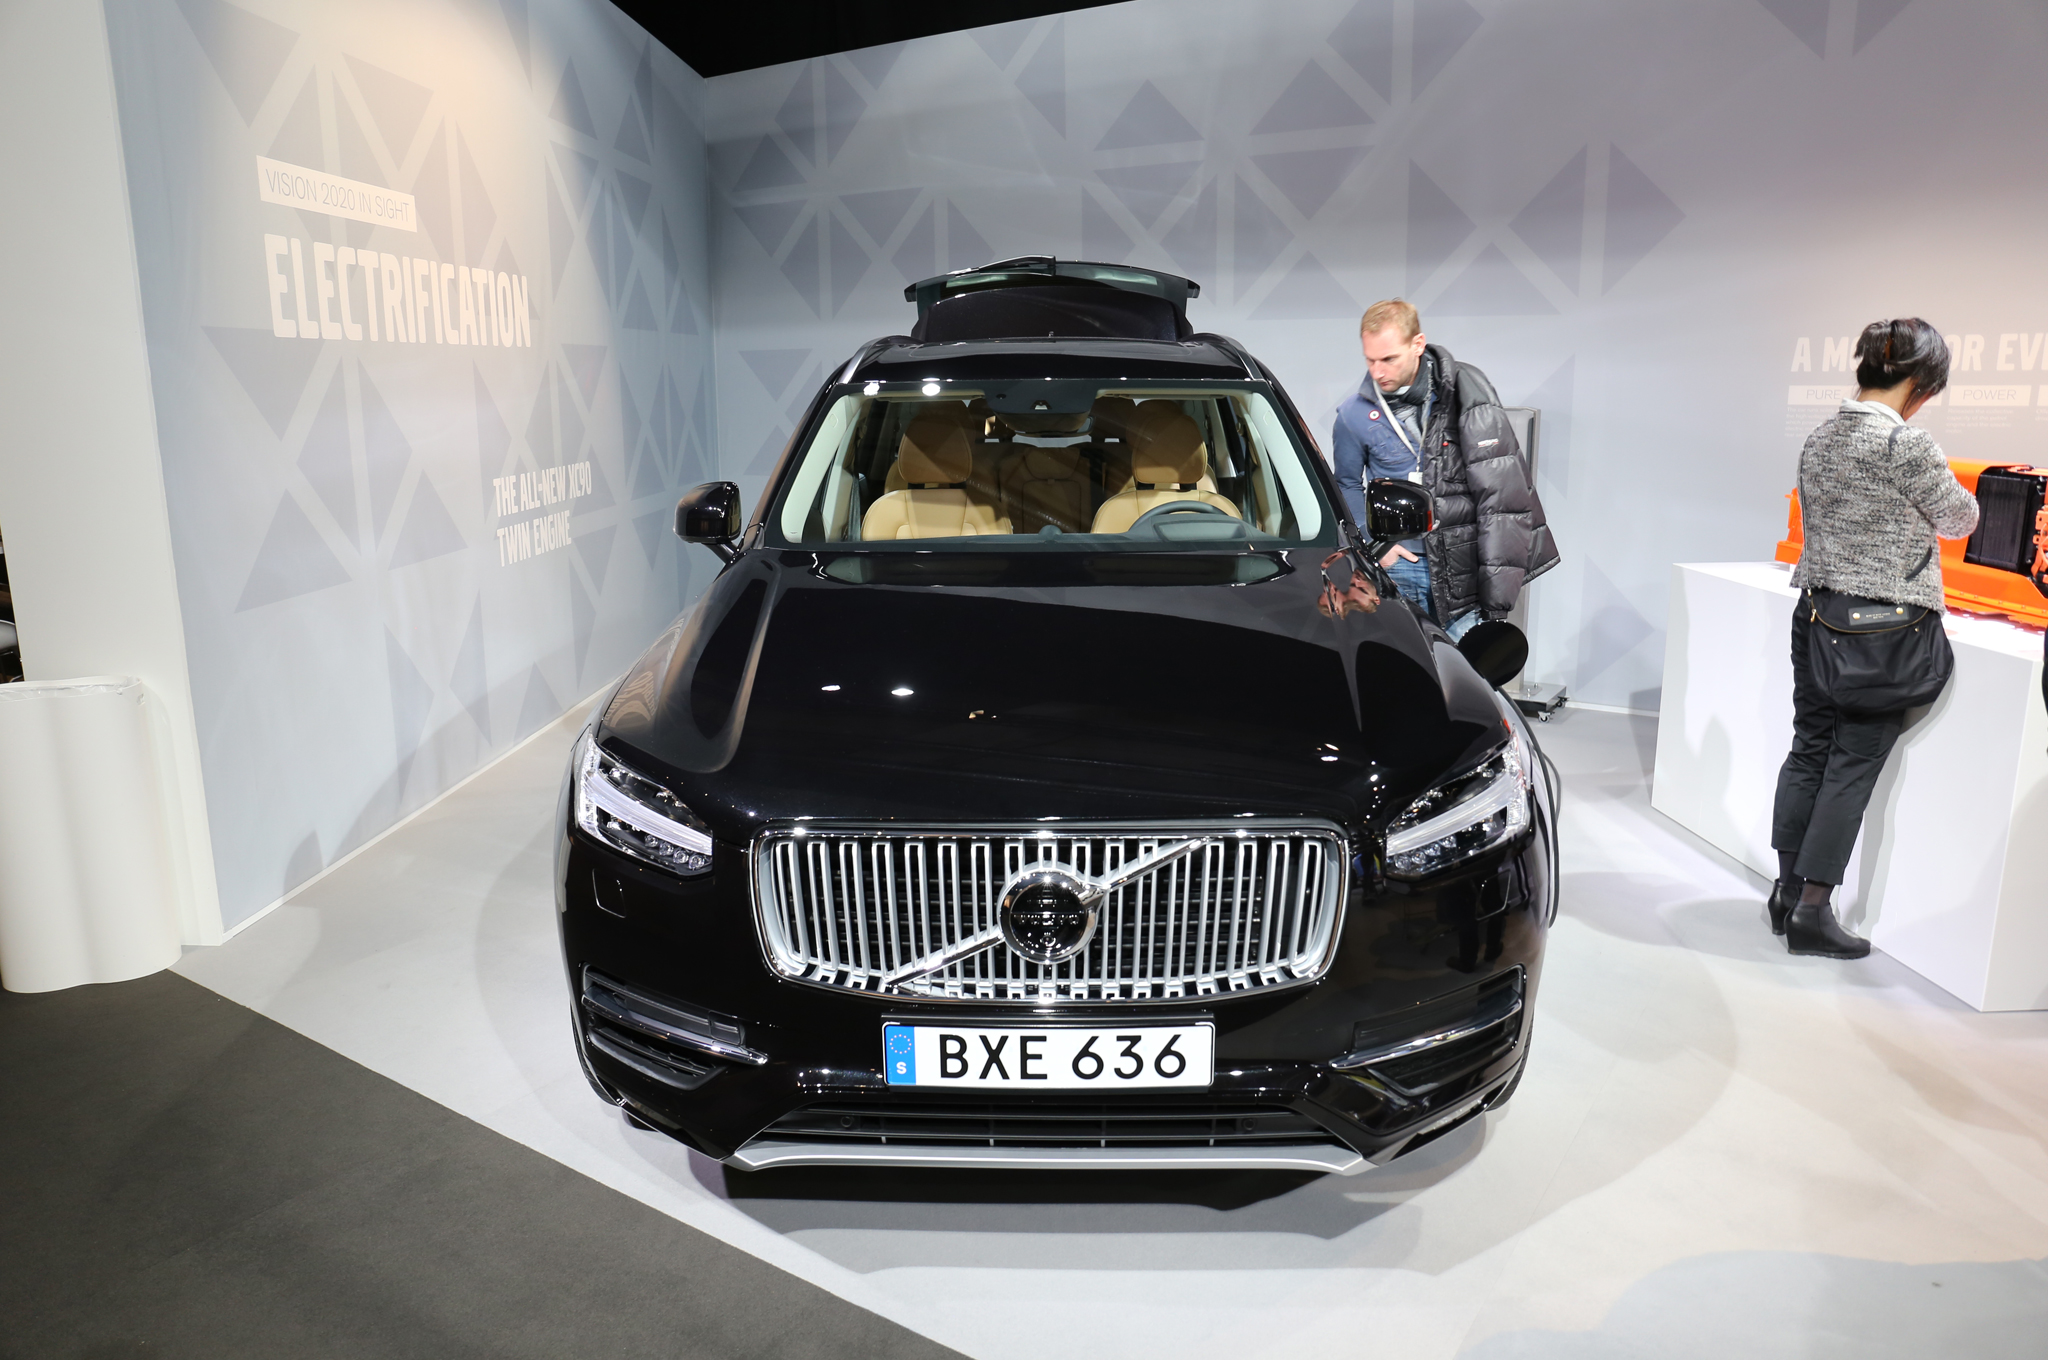 2016 Volvo XC90 T8 Black Exterior Preview